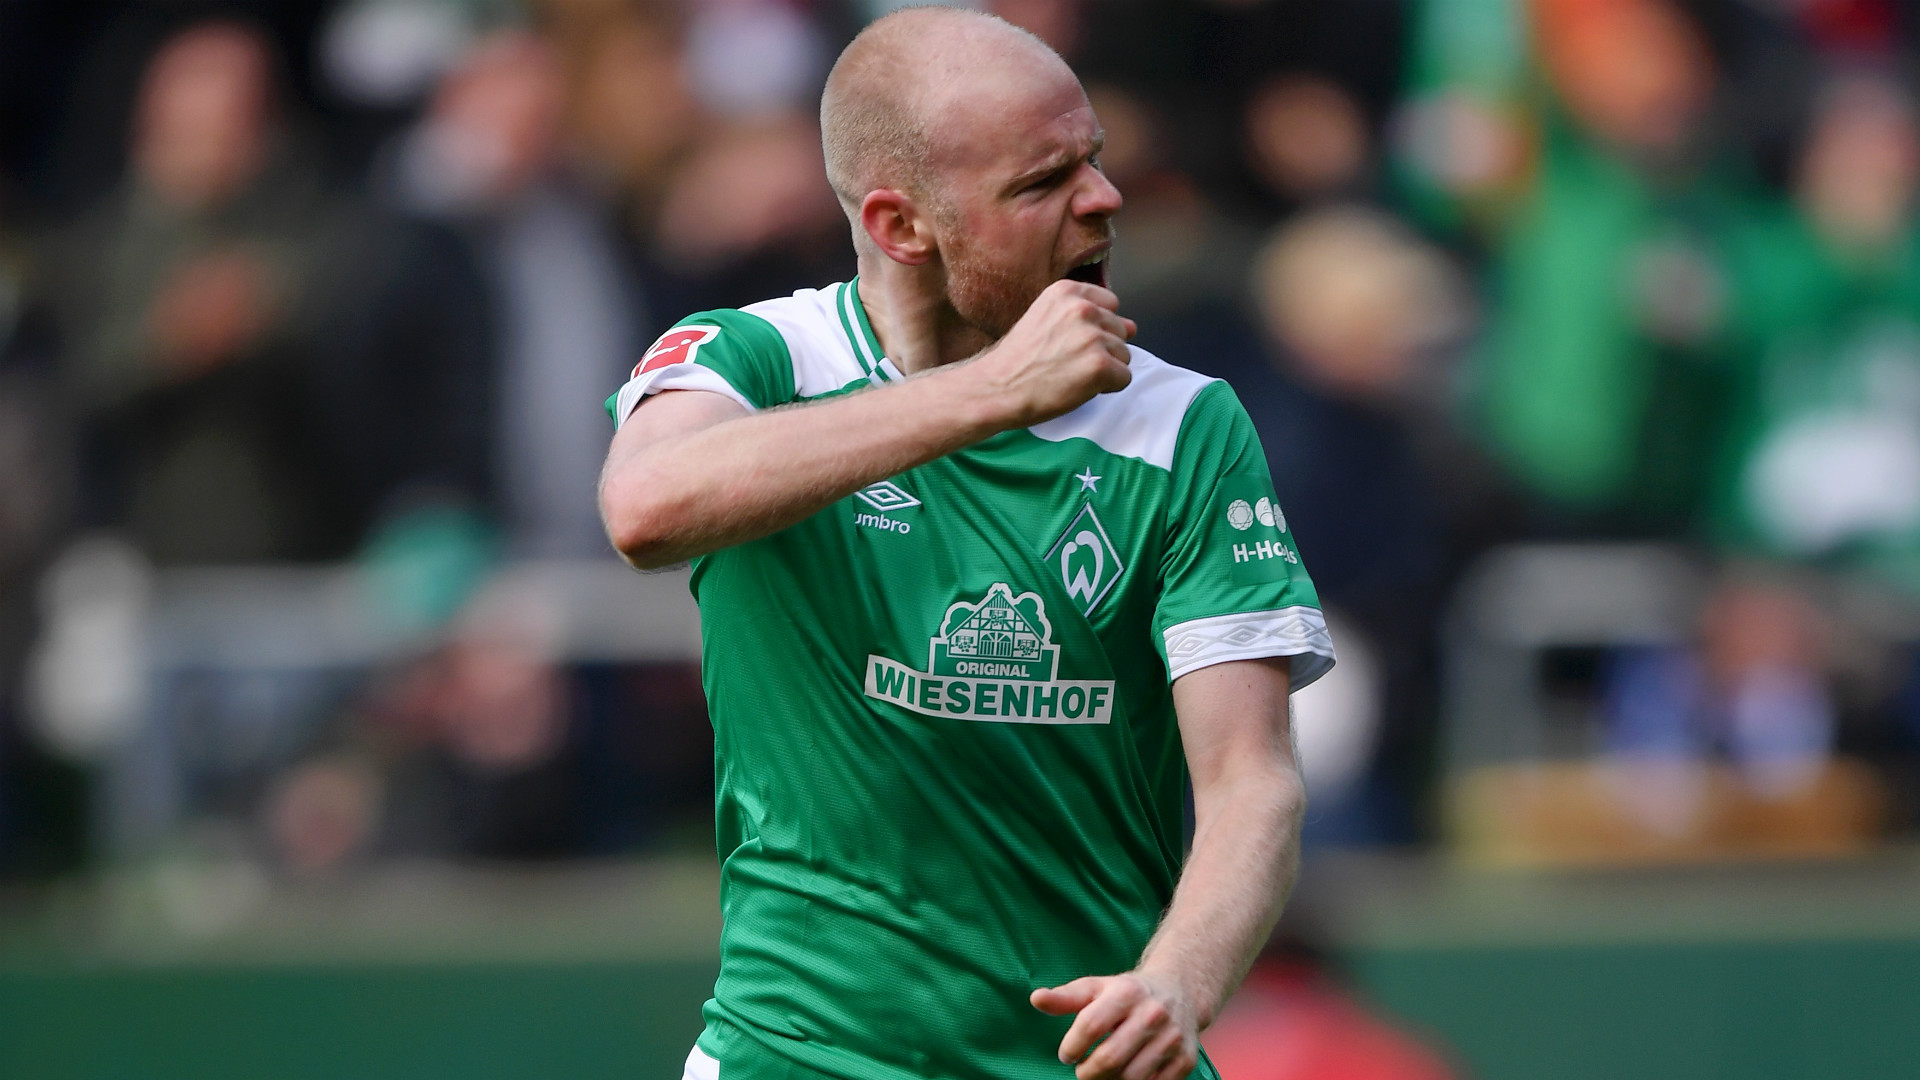 Werder Bremen Klaassen